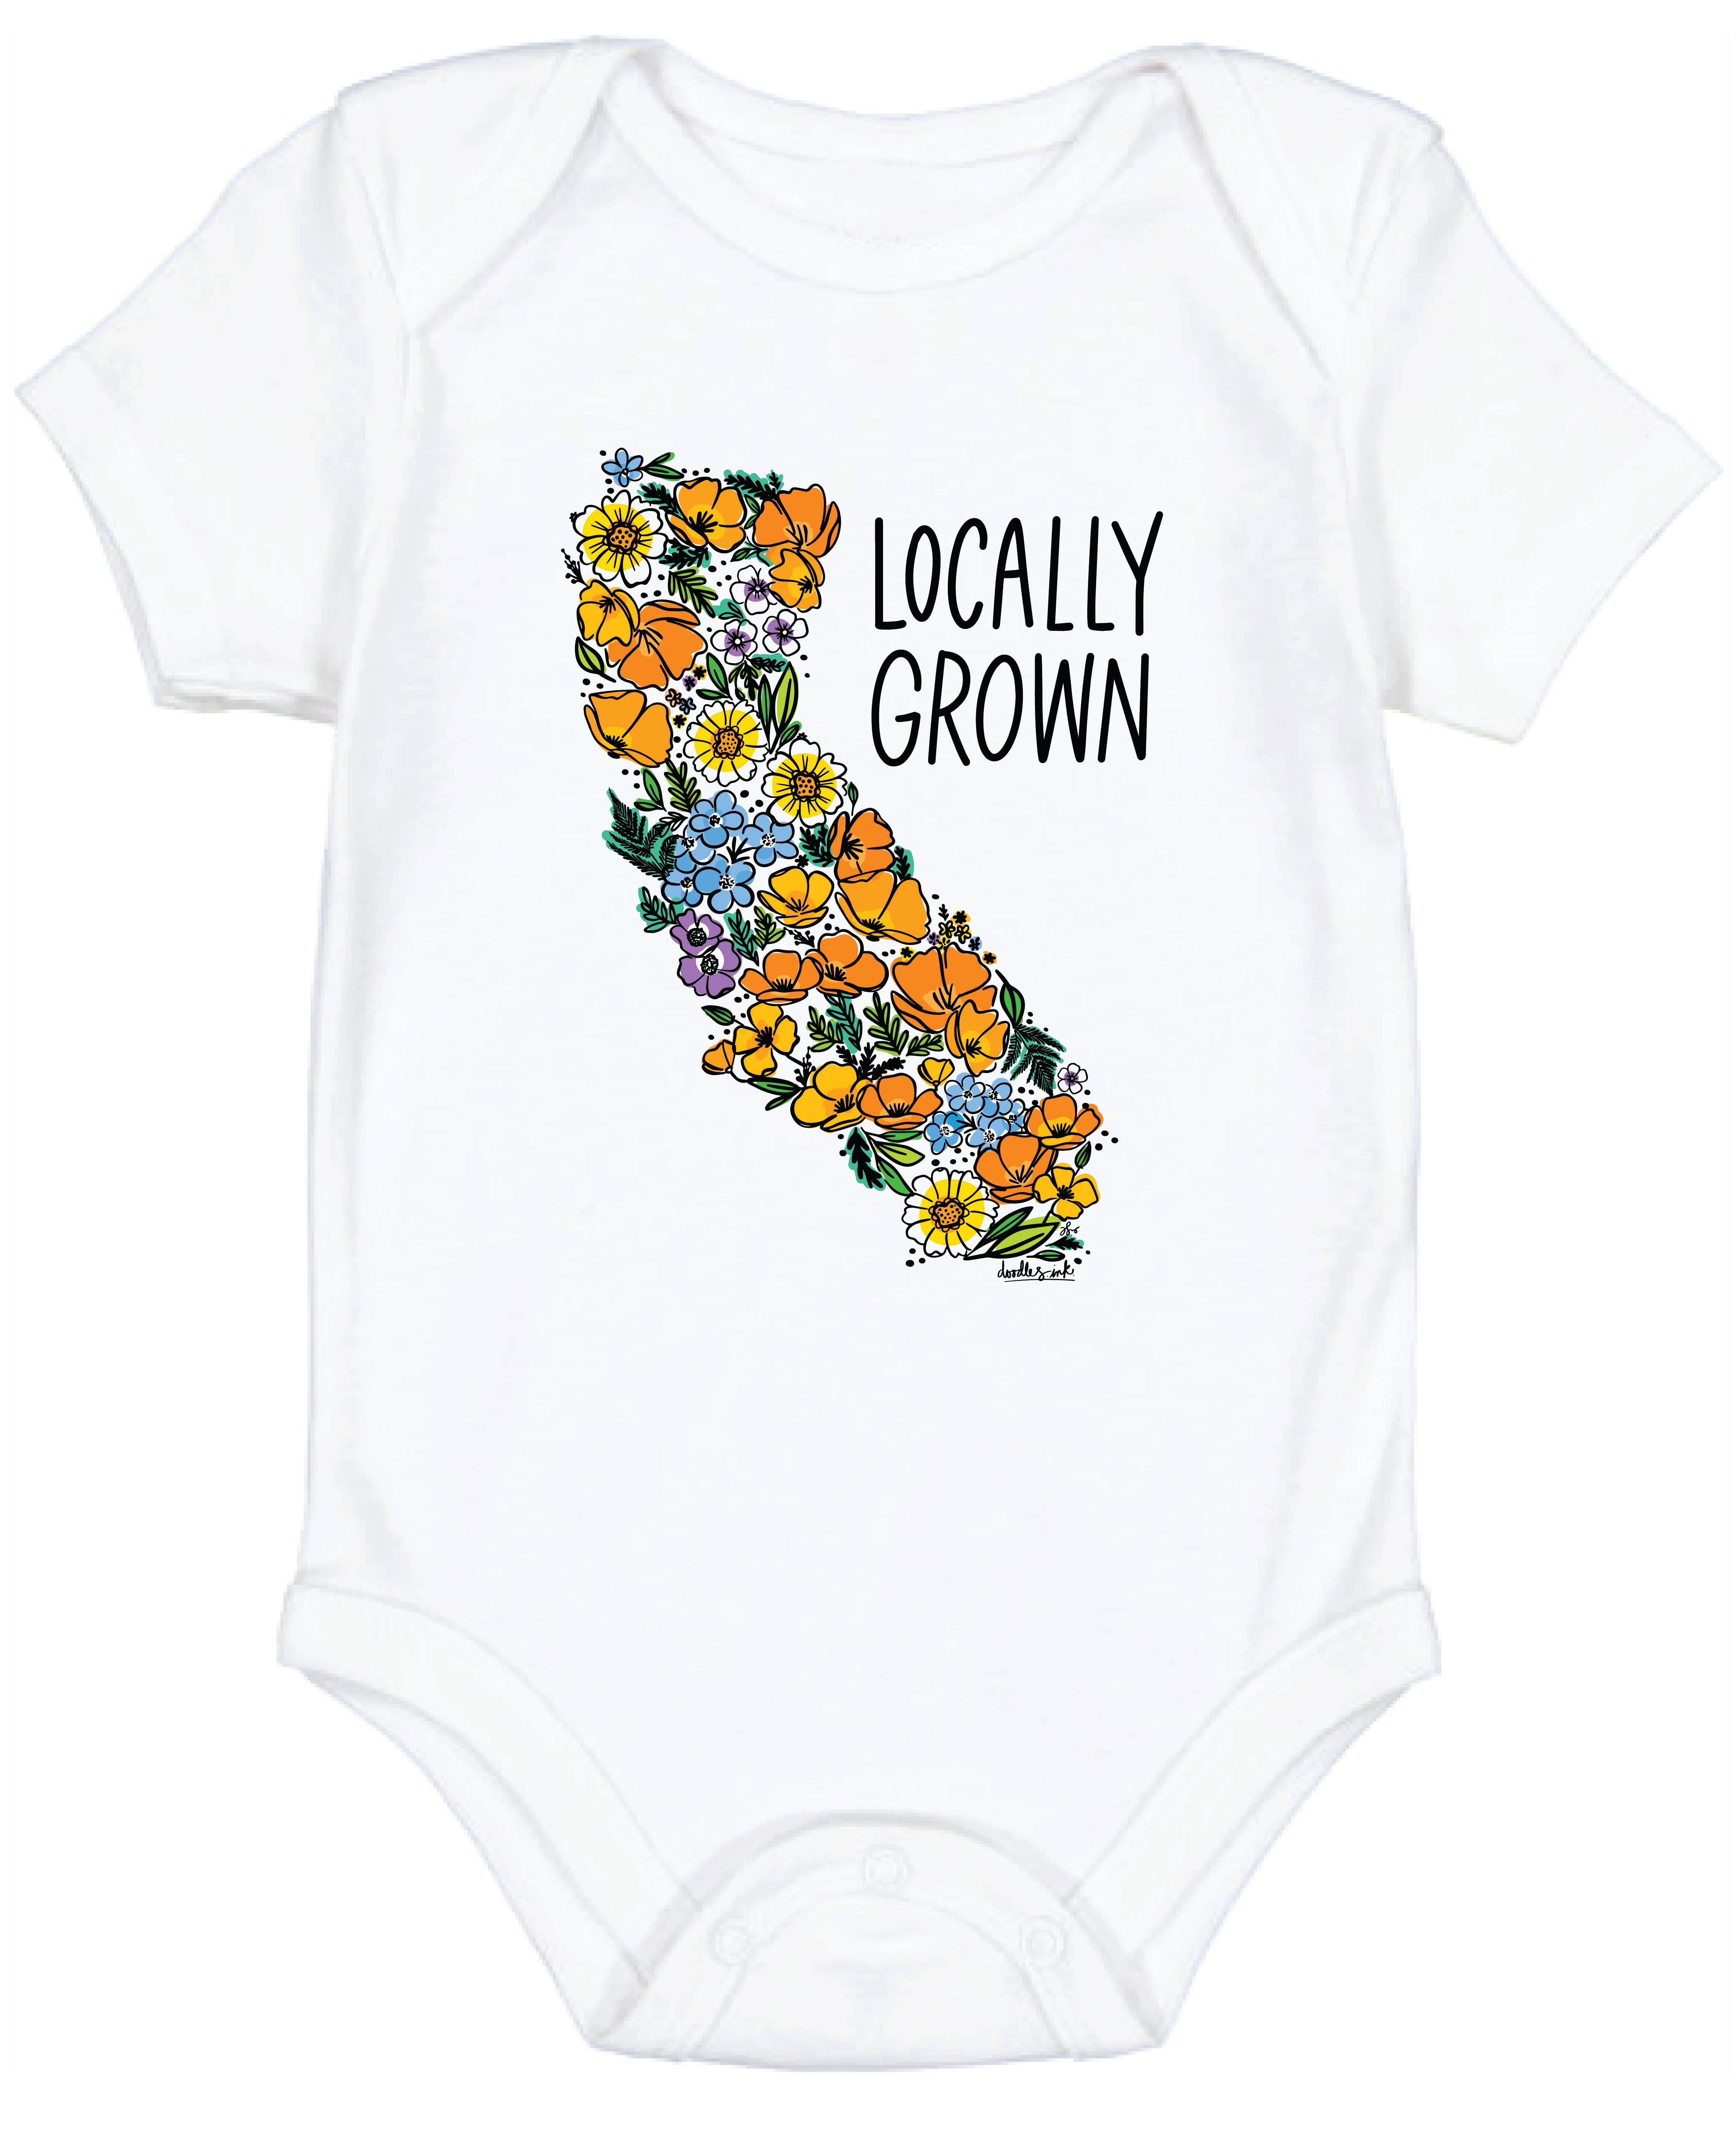 Vest,Baby Grow,Baby Clothes,Baby Bodysuit Bobwhite Quail One Piece 100/% Cotton